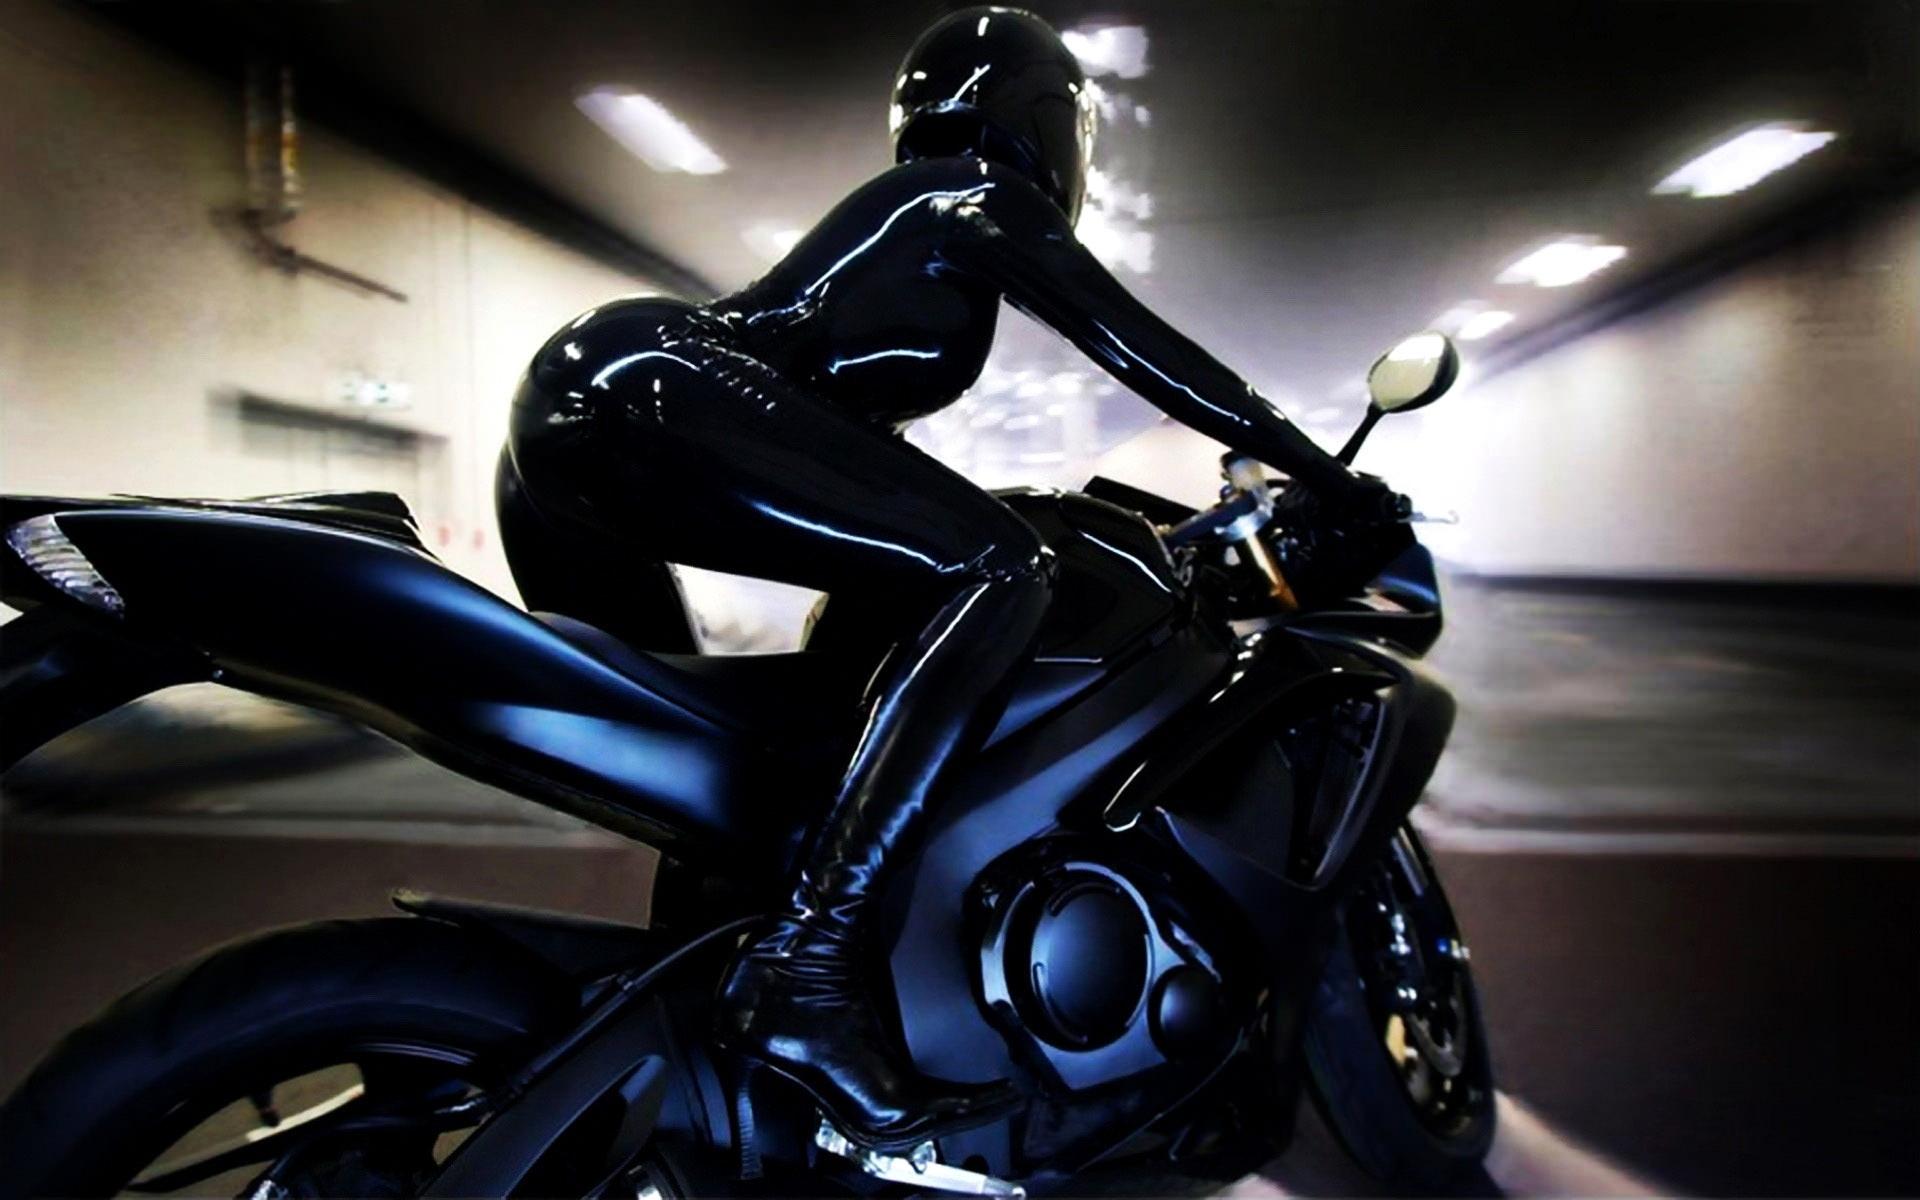 Fds Black Funny Gas Grass Or Ass Car Vehicle Motorcycle Table Laptop Door Window Bumper Decal Vinyl Jdm Sticker